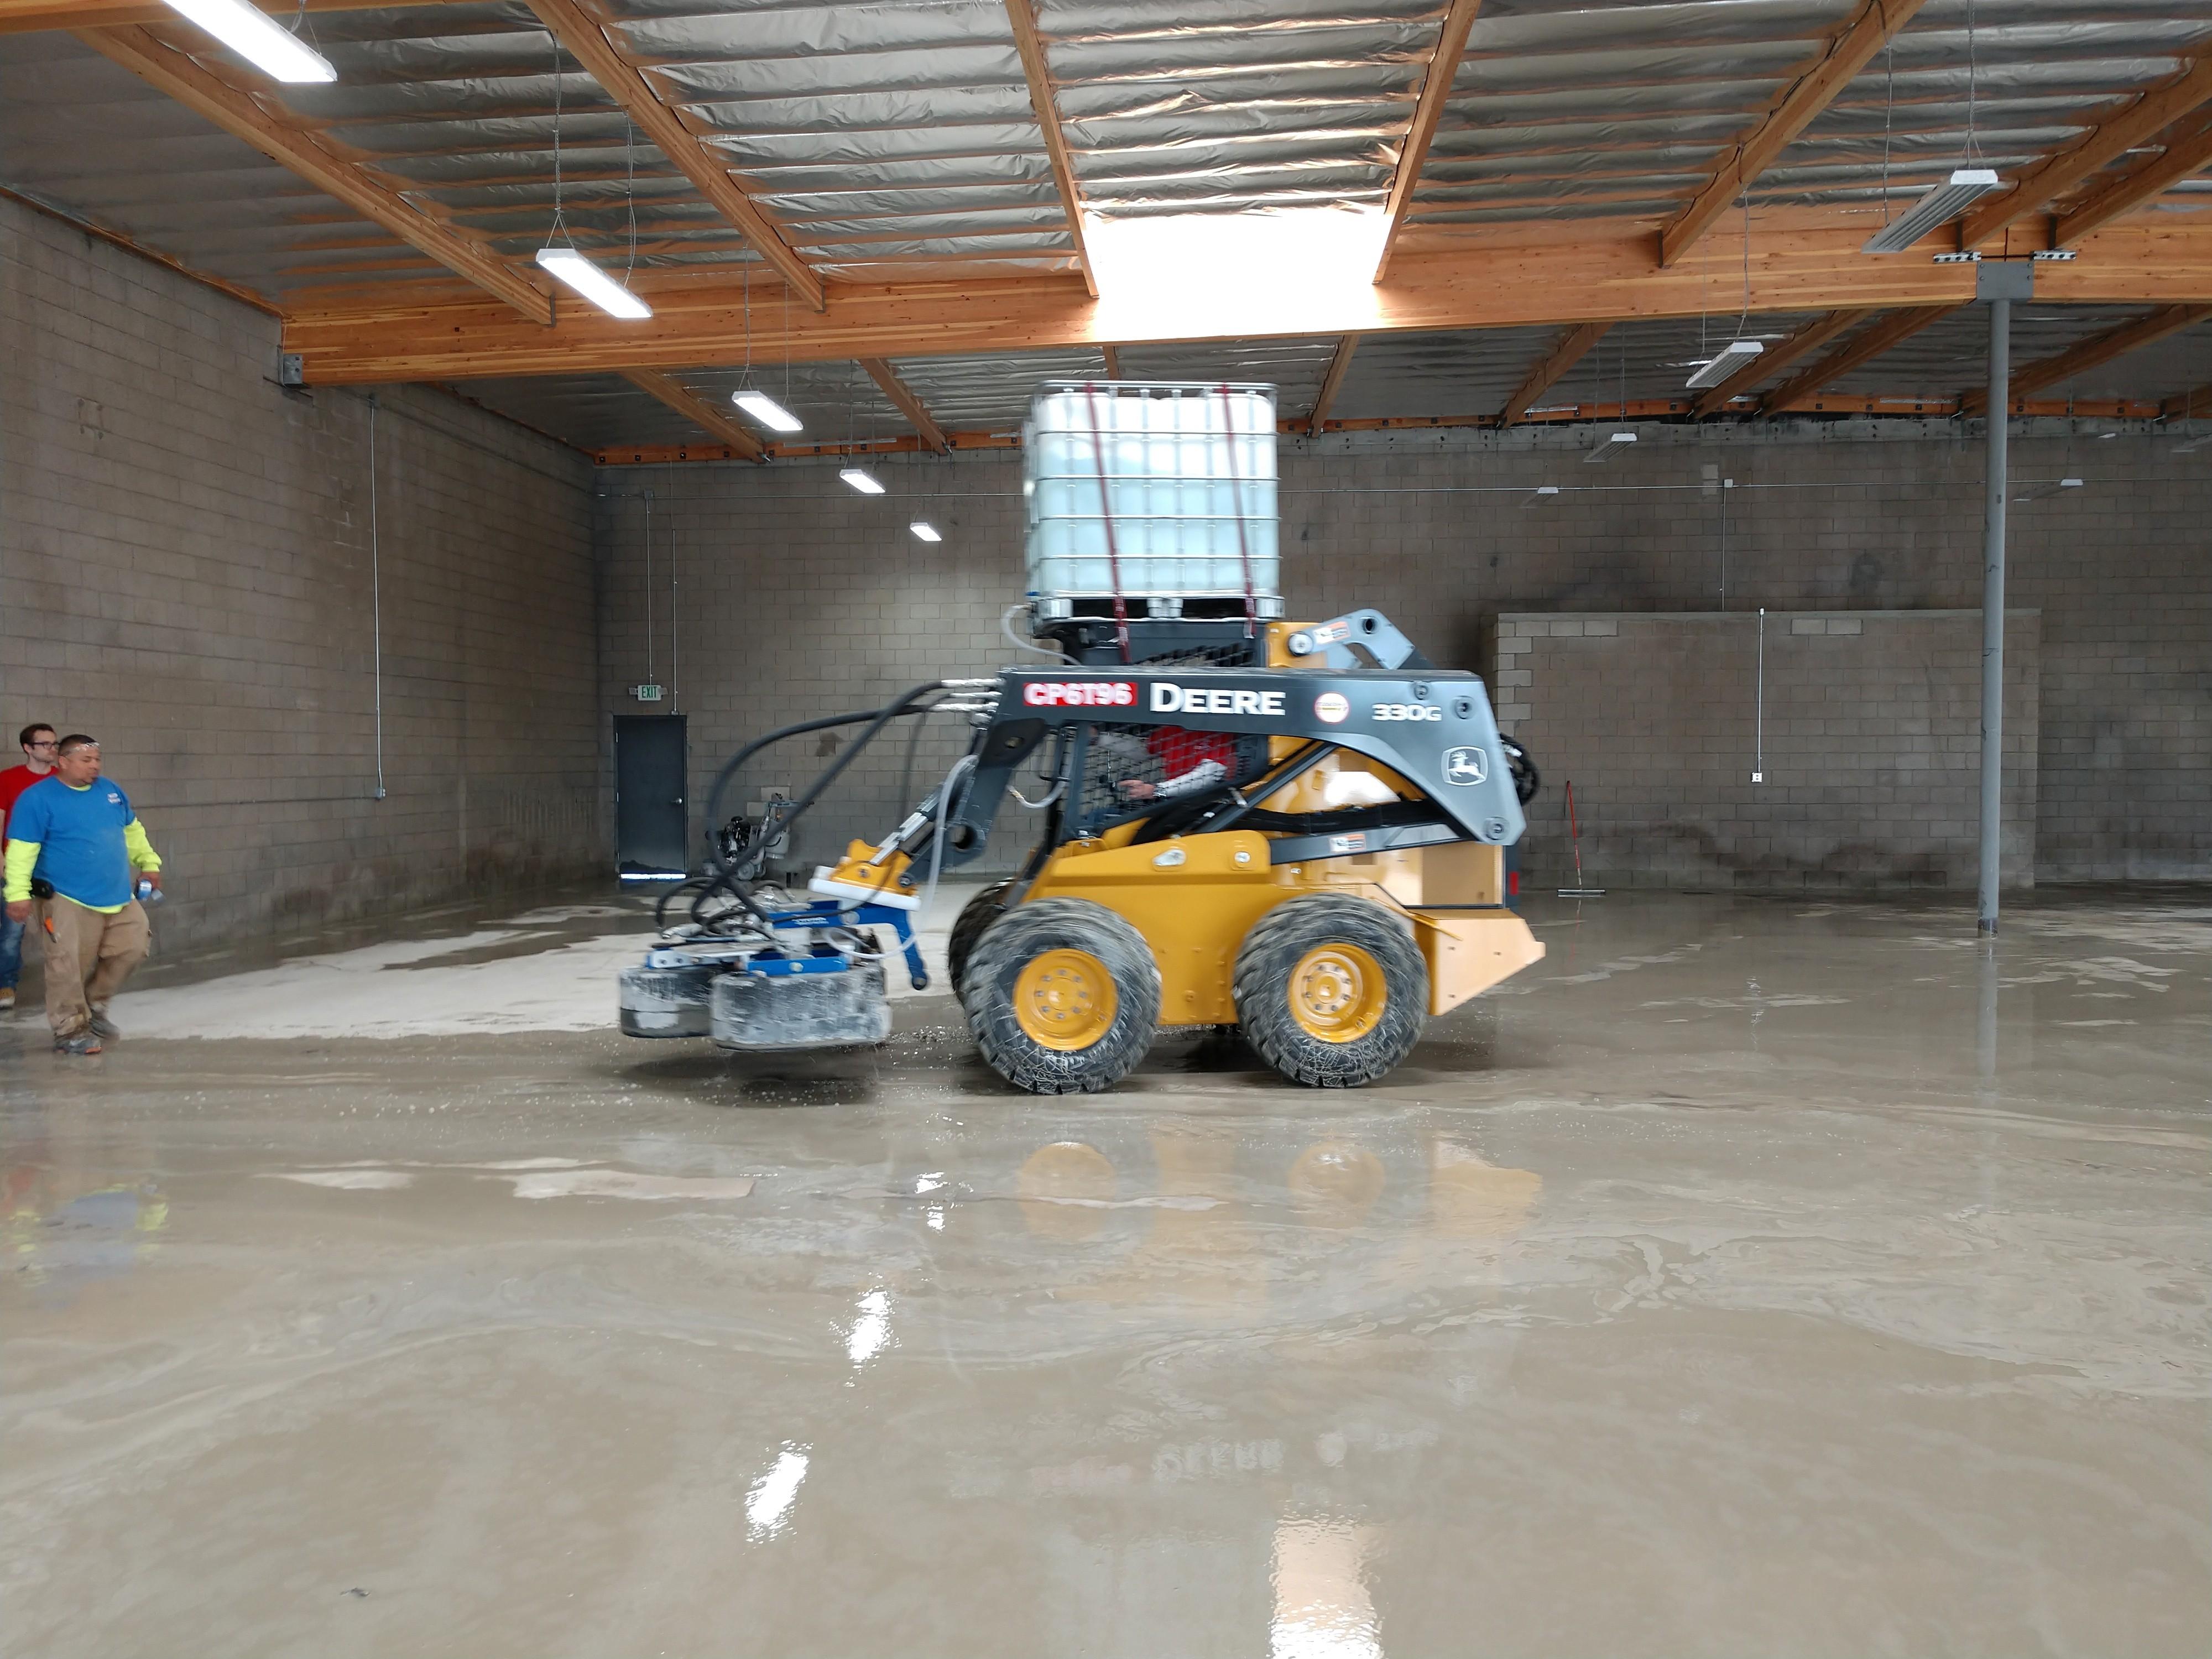 American Concrete Polishing / Blason Industries | LinkedIn